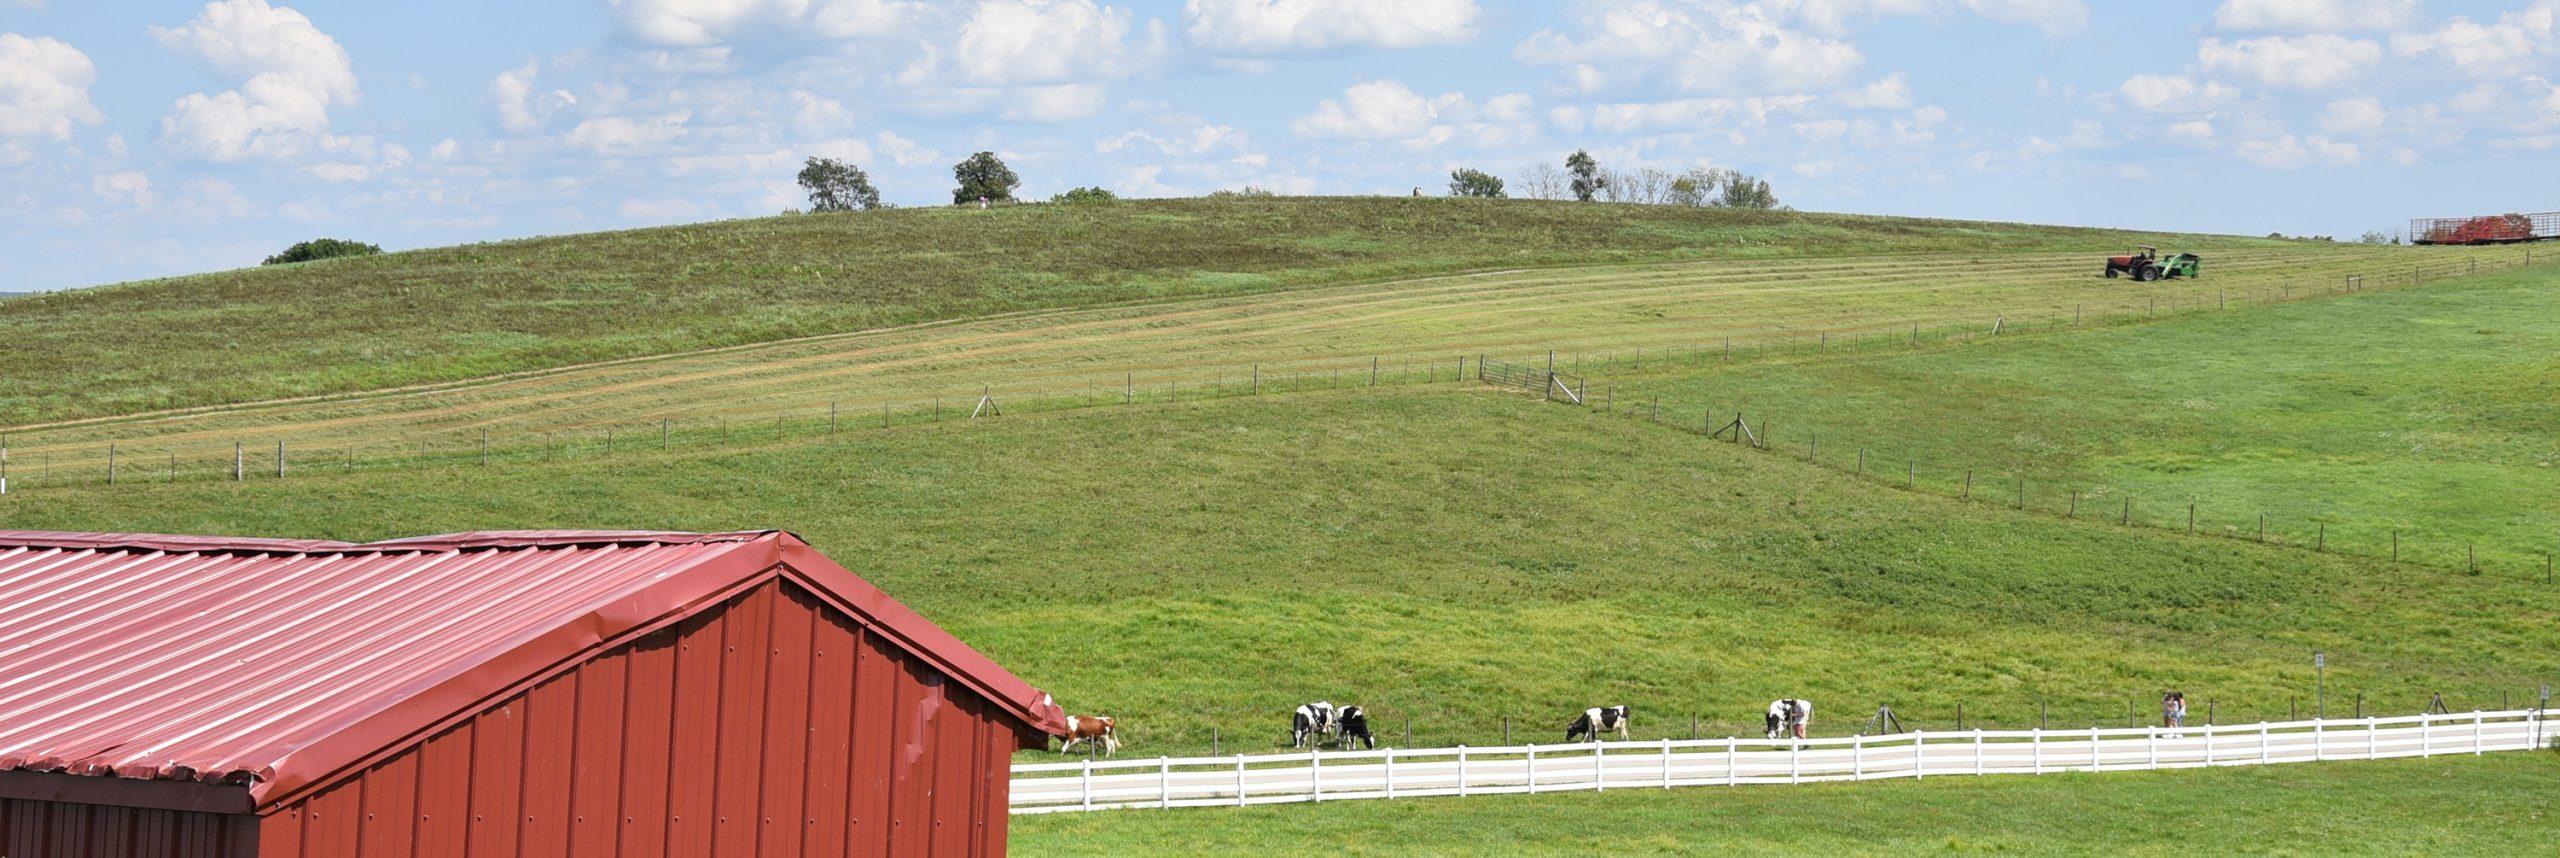 A view of Horsebarn hill